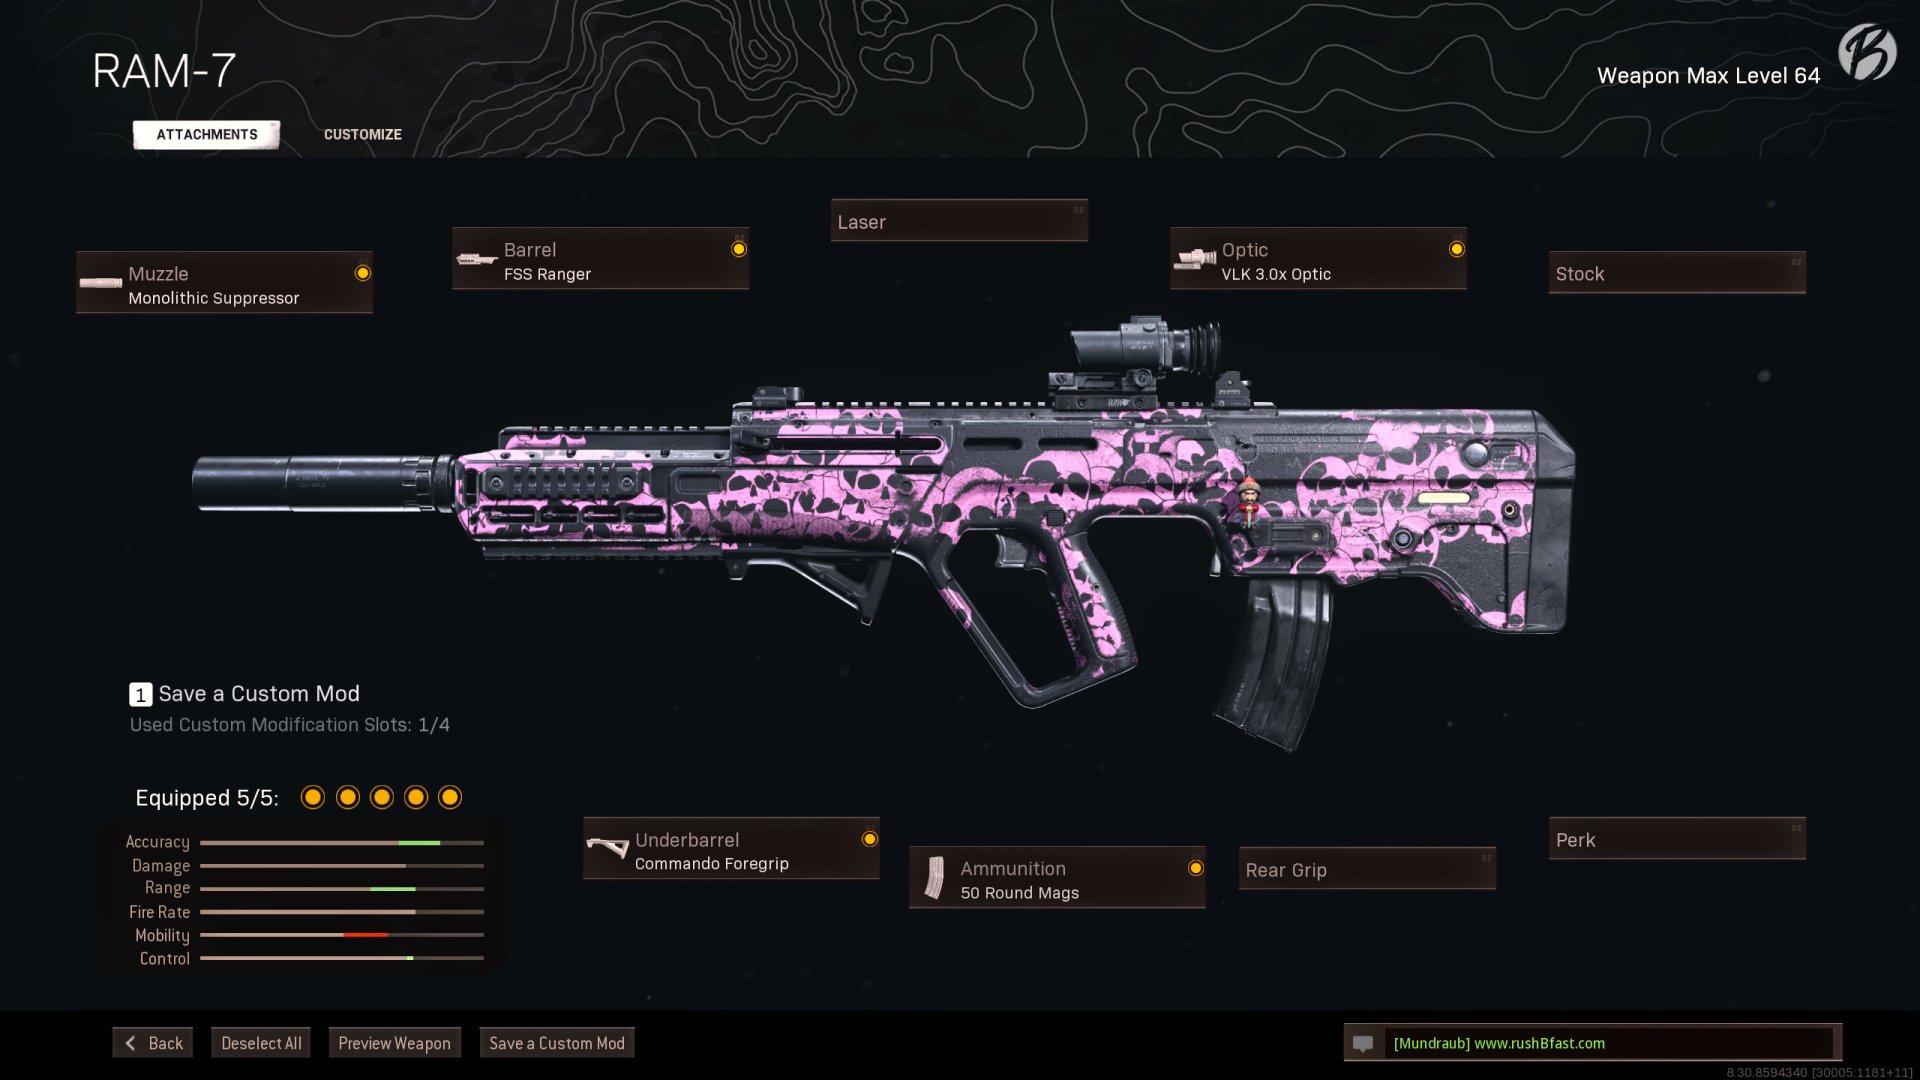 Call of Duty Warzone - Cold War Season 1 - RAM-7